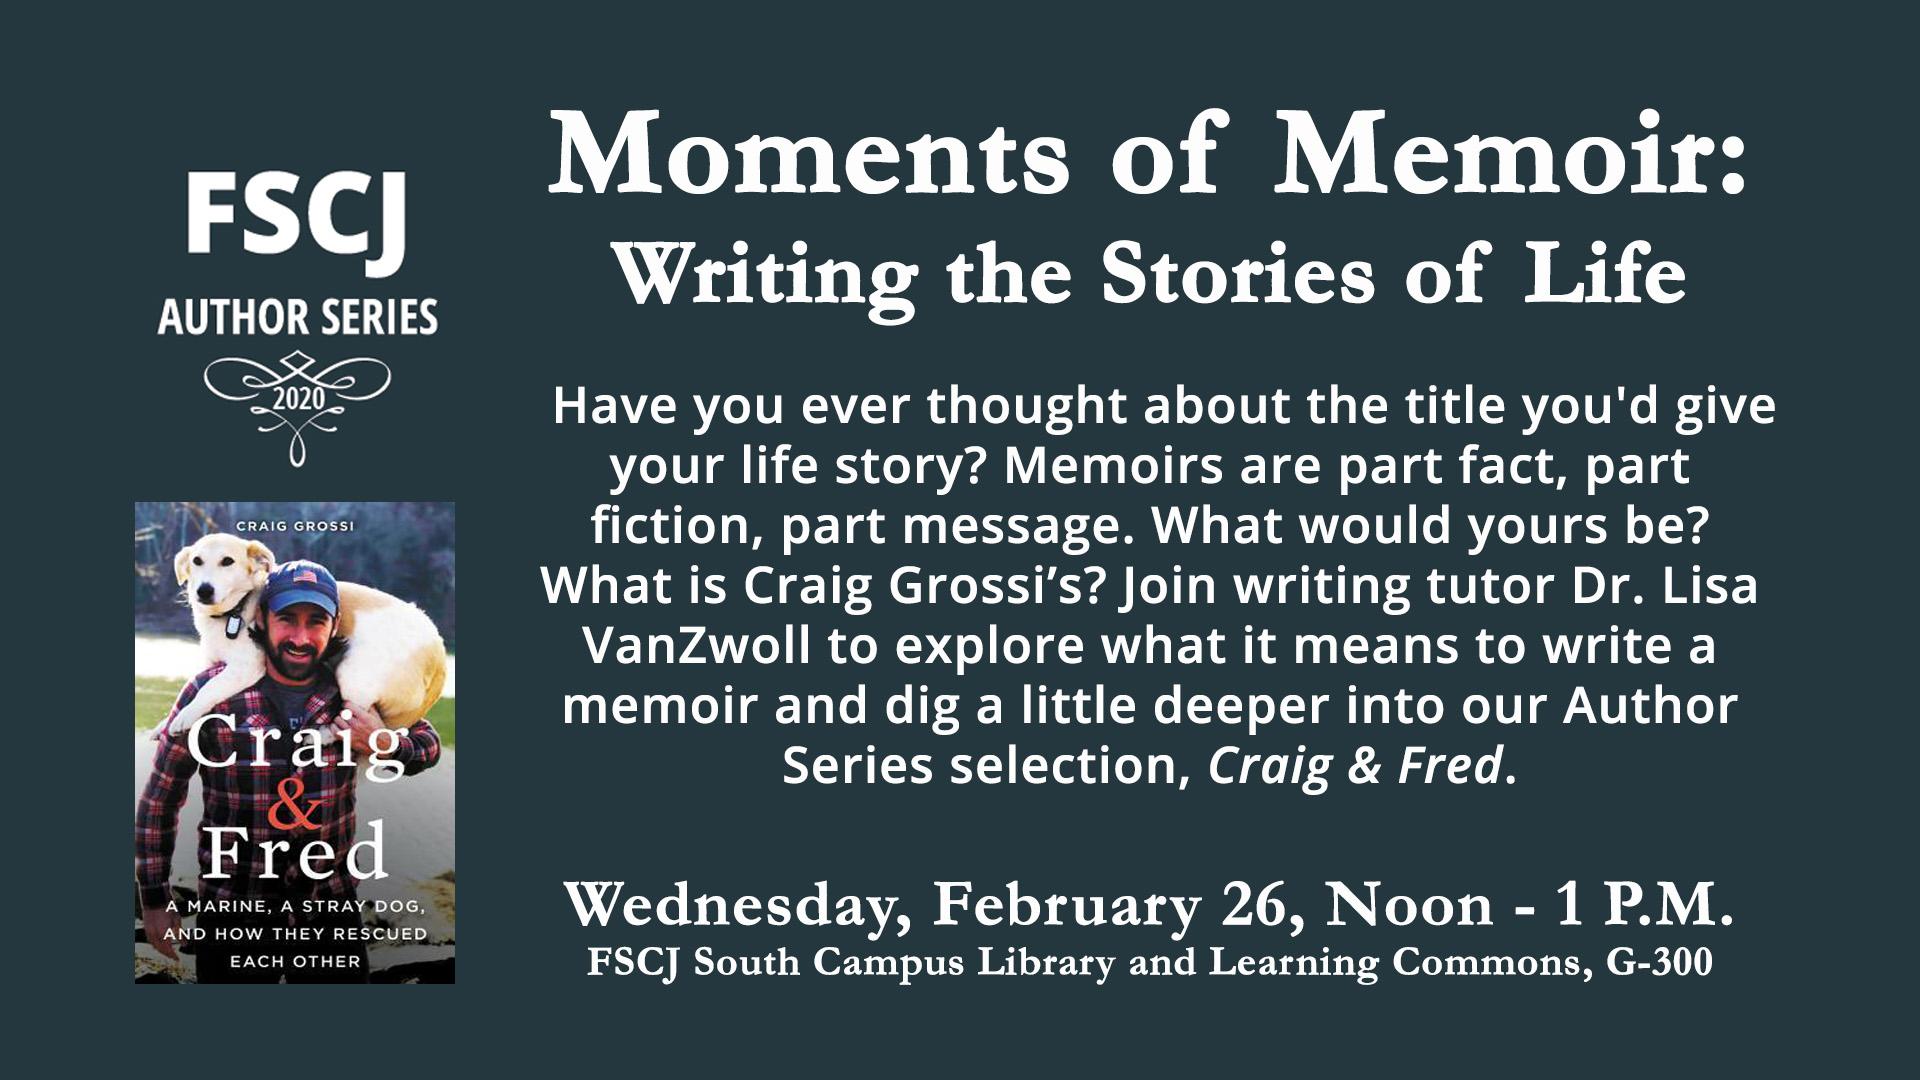 Moments of Memoir: An FSCJ Author Series Event